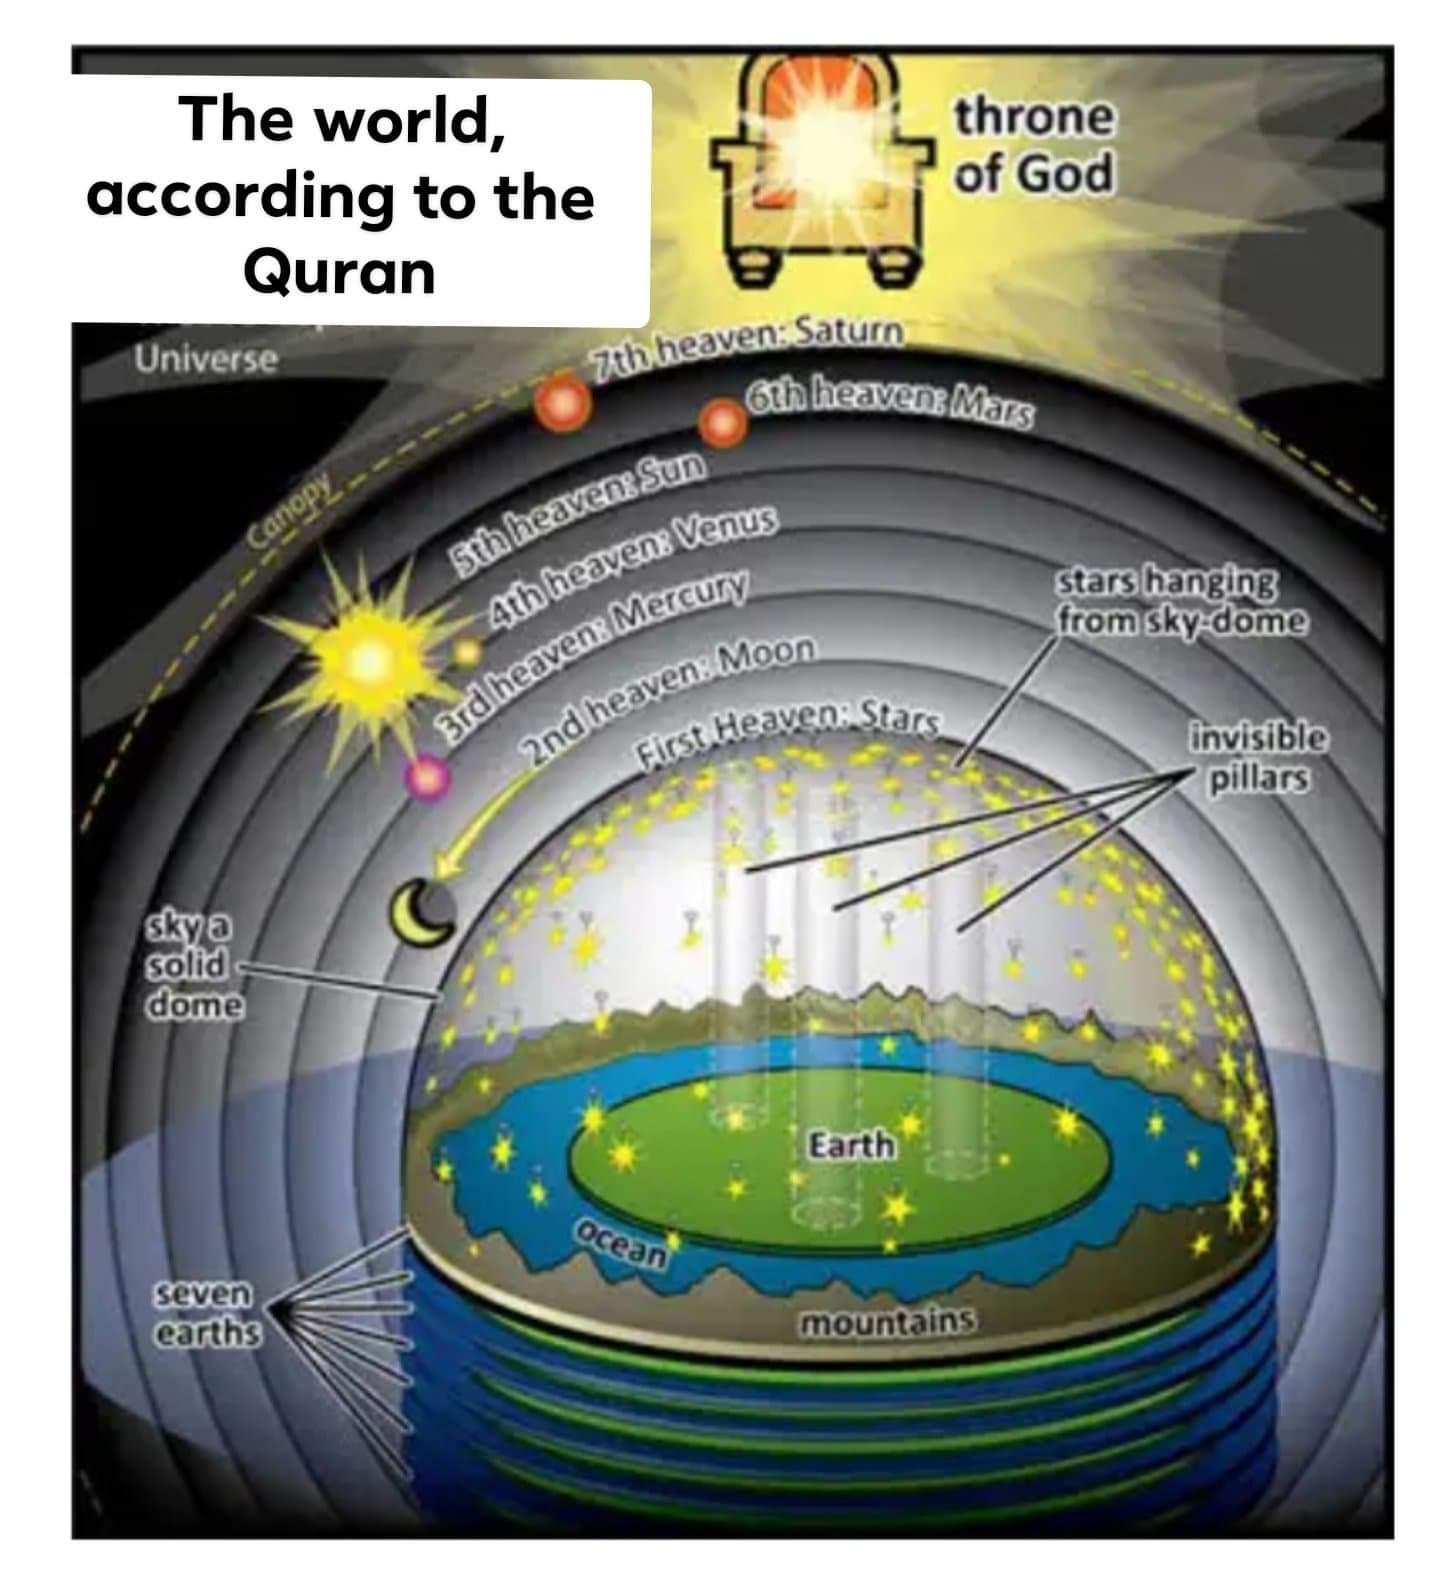 scientific error in quran seven heavens seven earths hadith